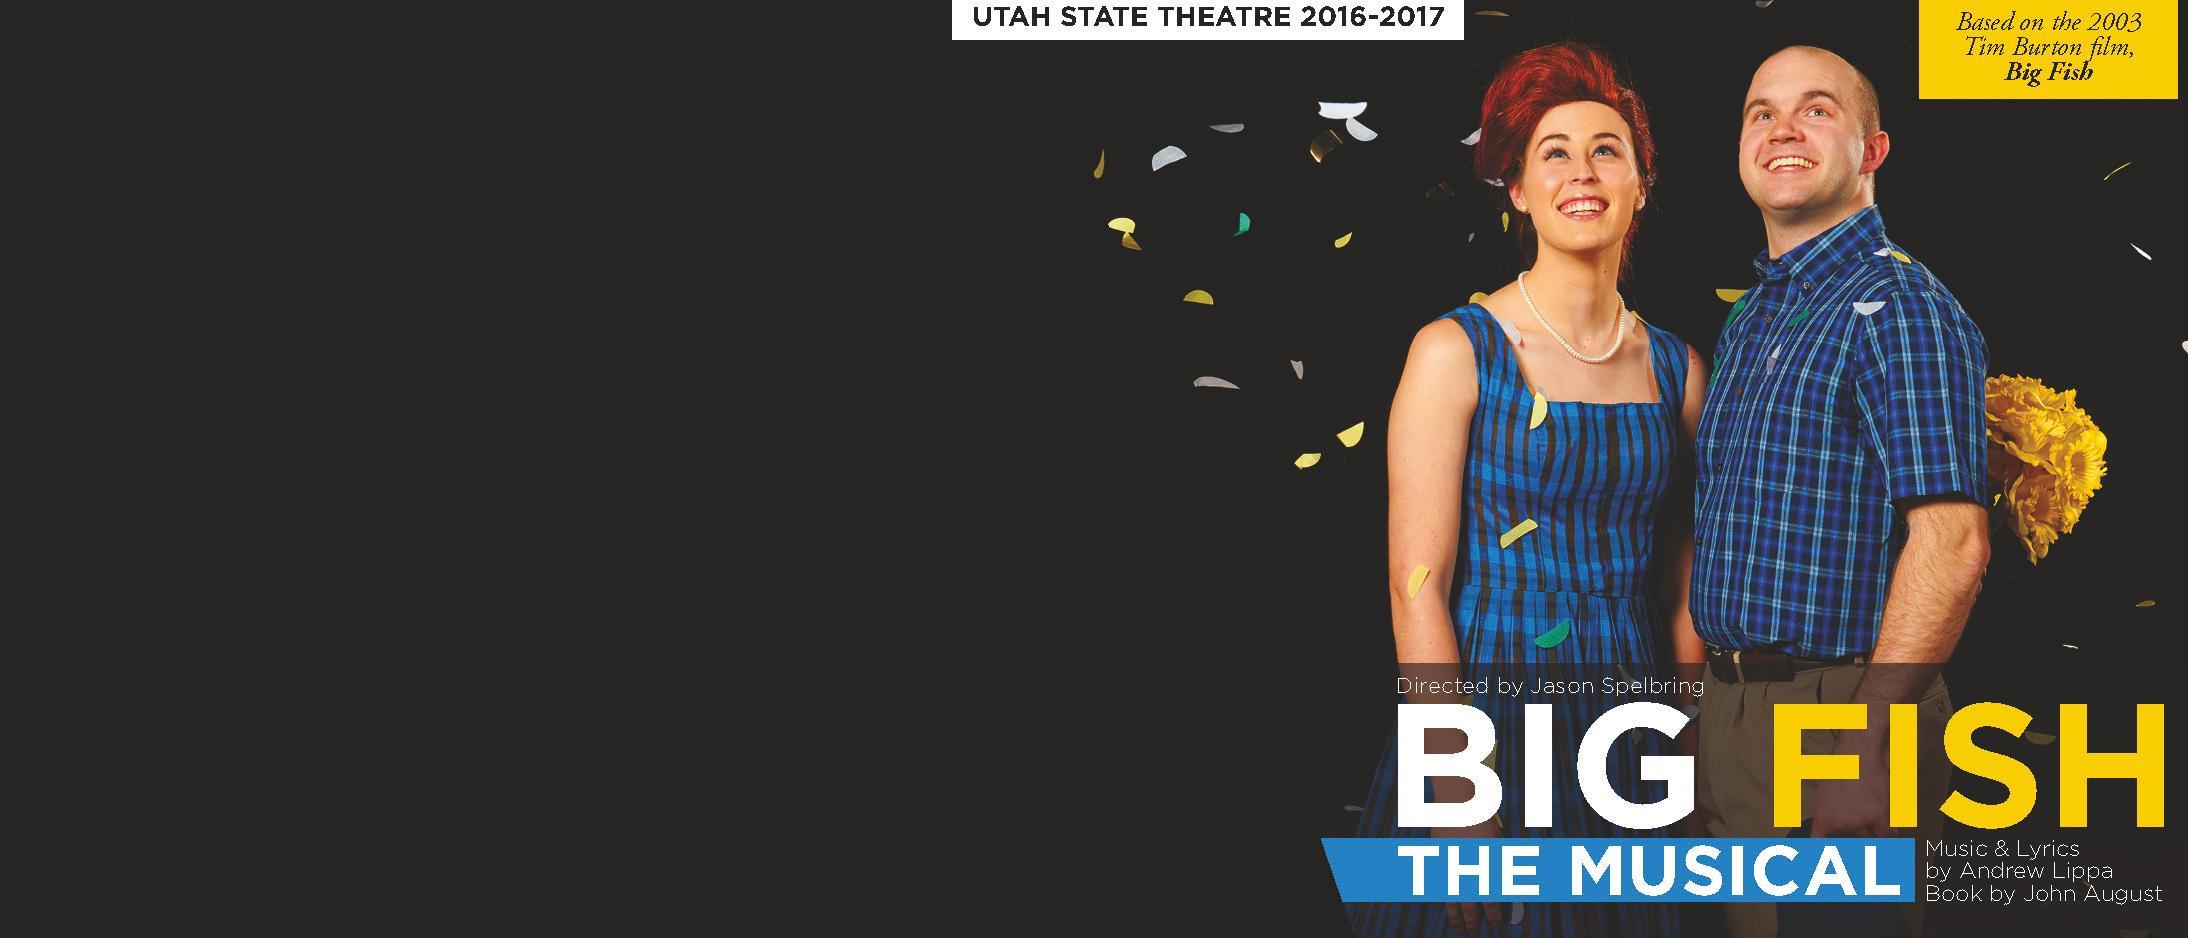 April 14-15, 19-21 | 7:30 p.m. | April 22 | 2 p.m. | Morgan Theatre | Chase Fine Arts Center | USU Campus